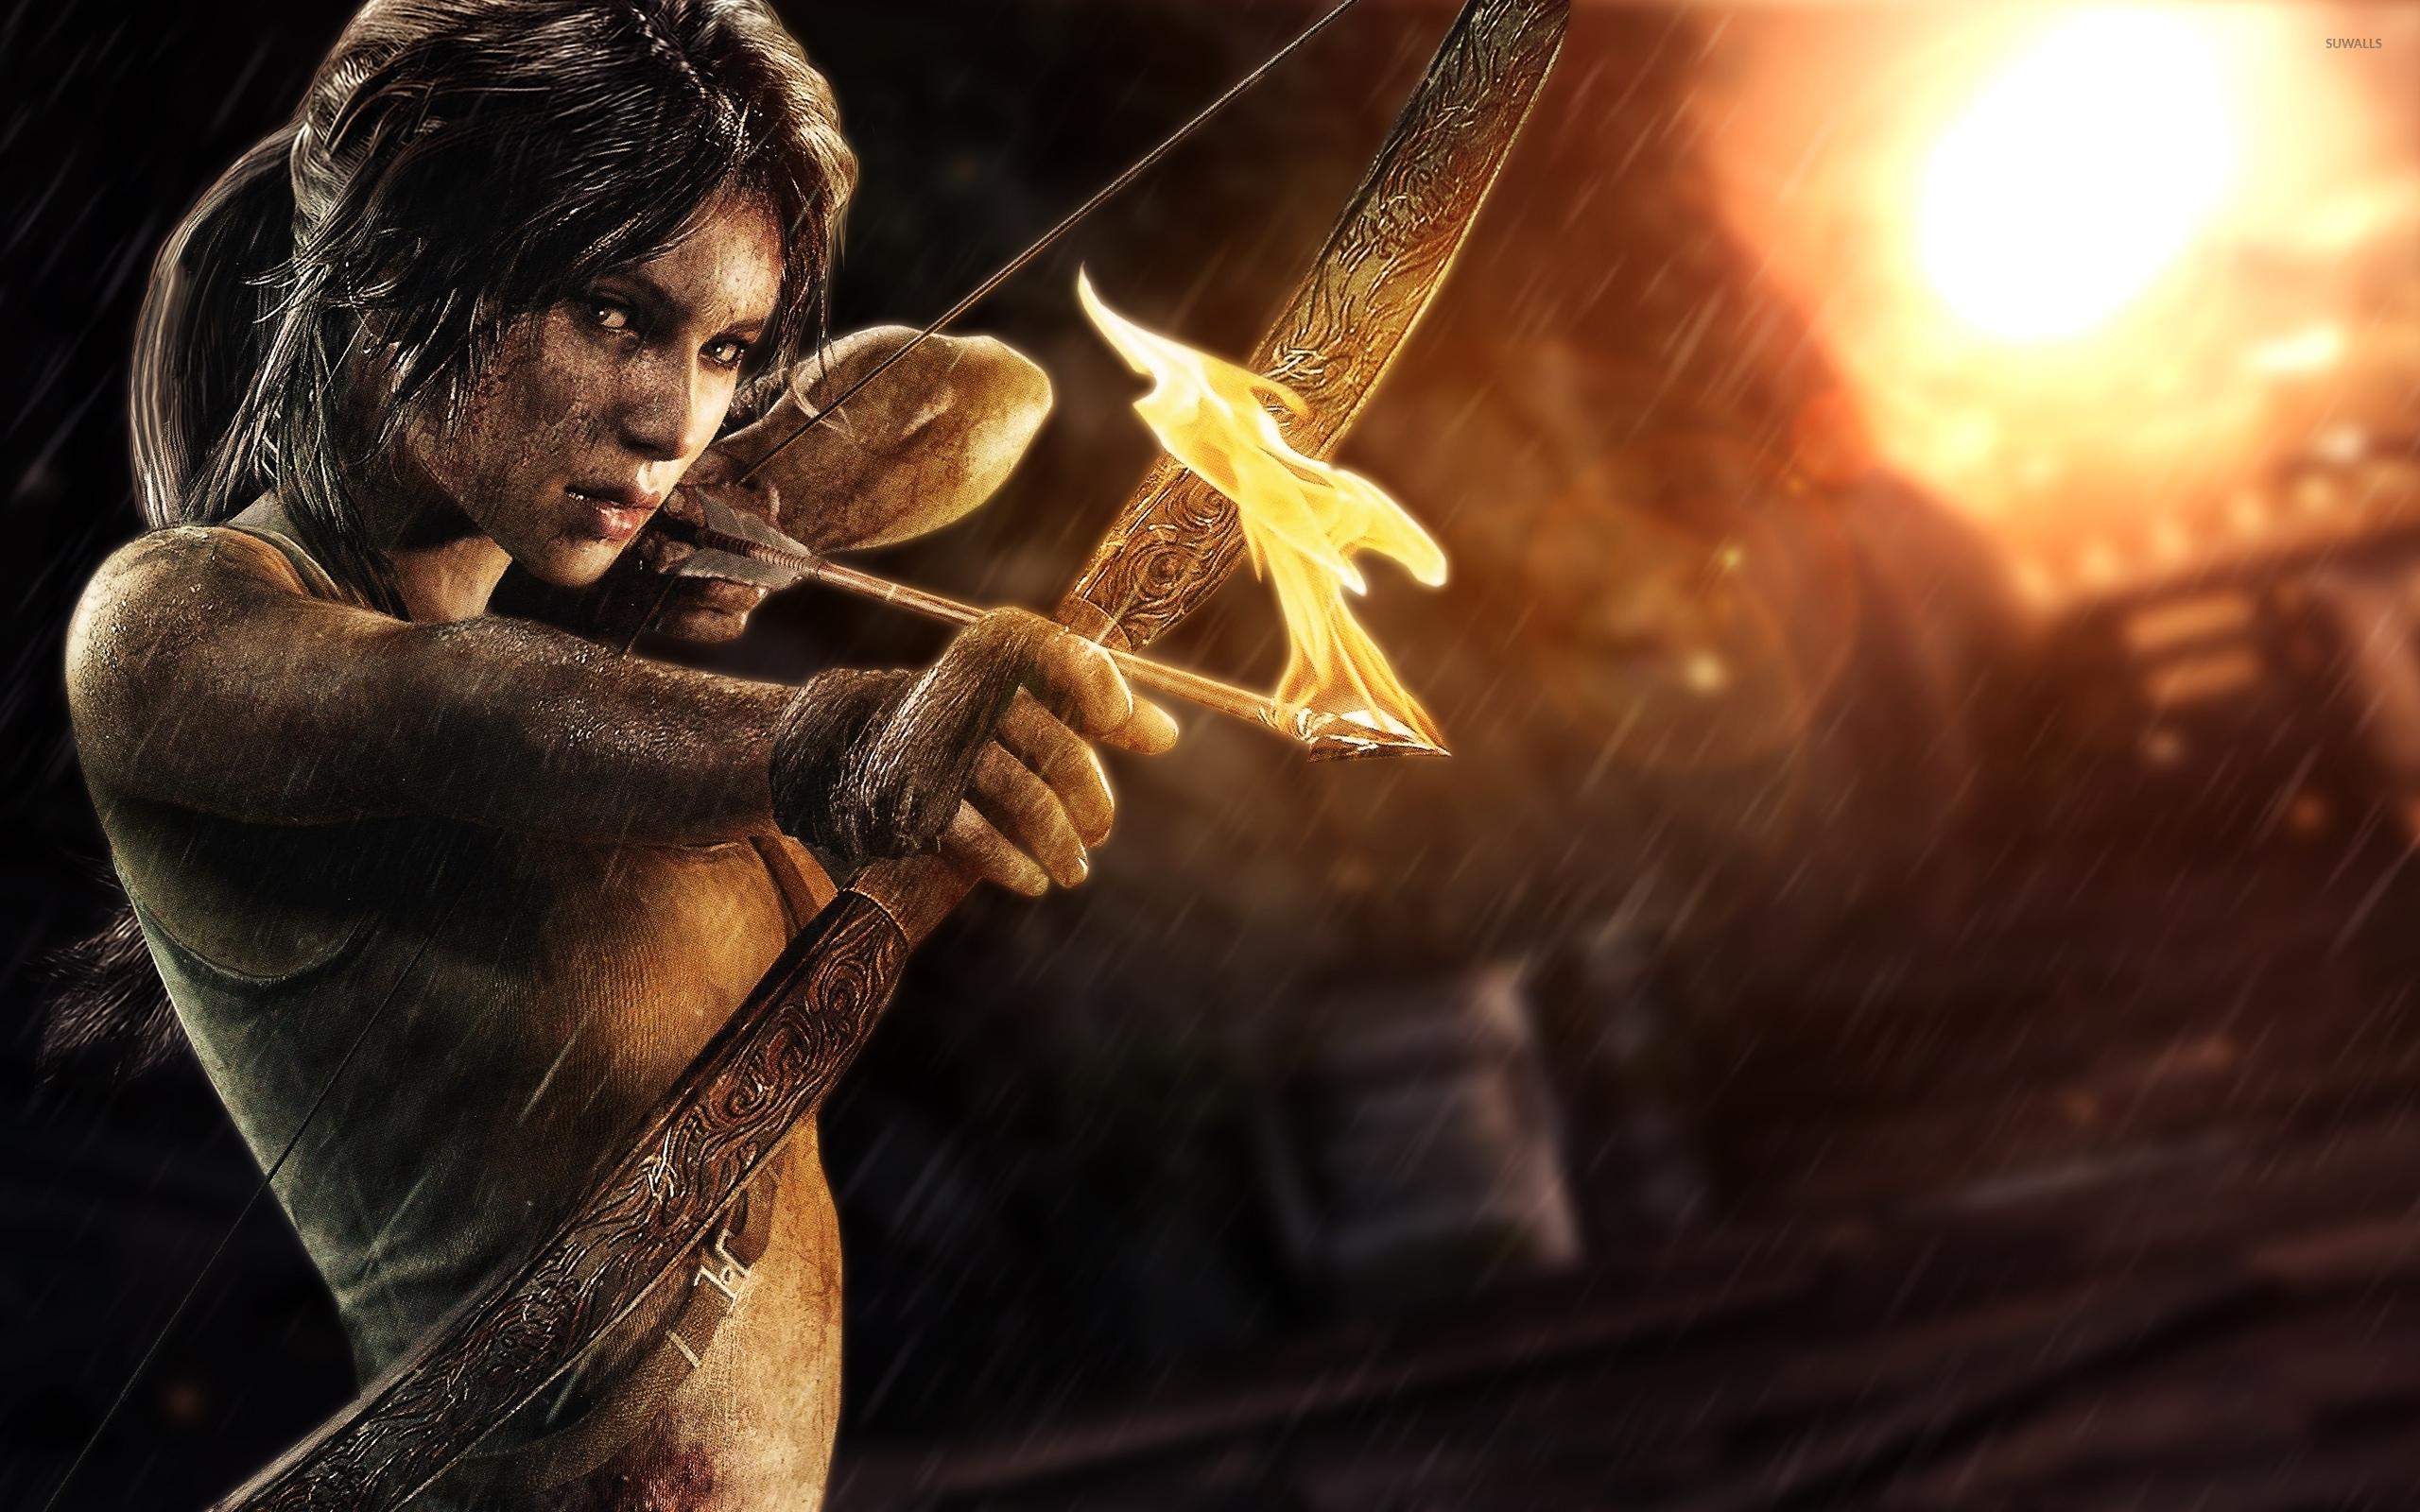 Lara Croft Rise Of The Tomb Raider 5 Wallpaper Game